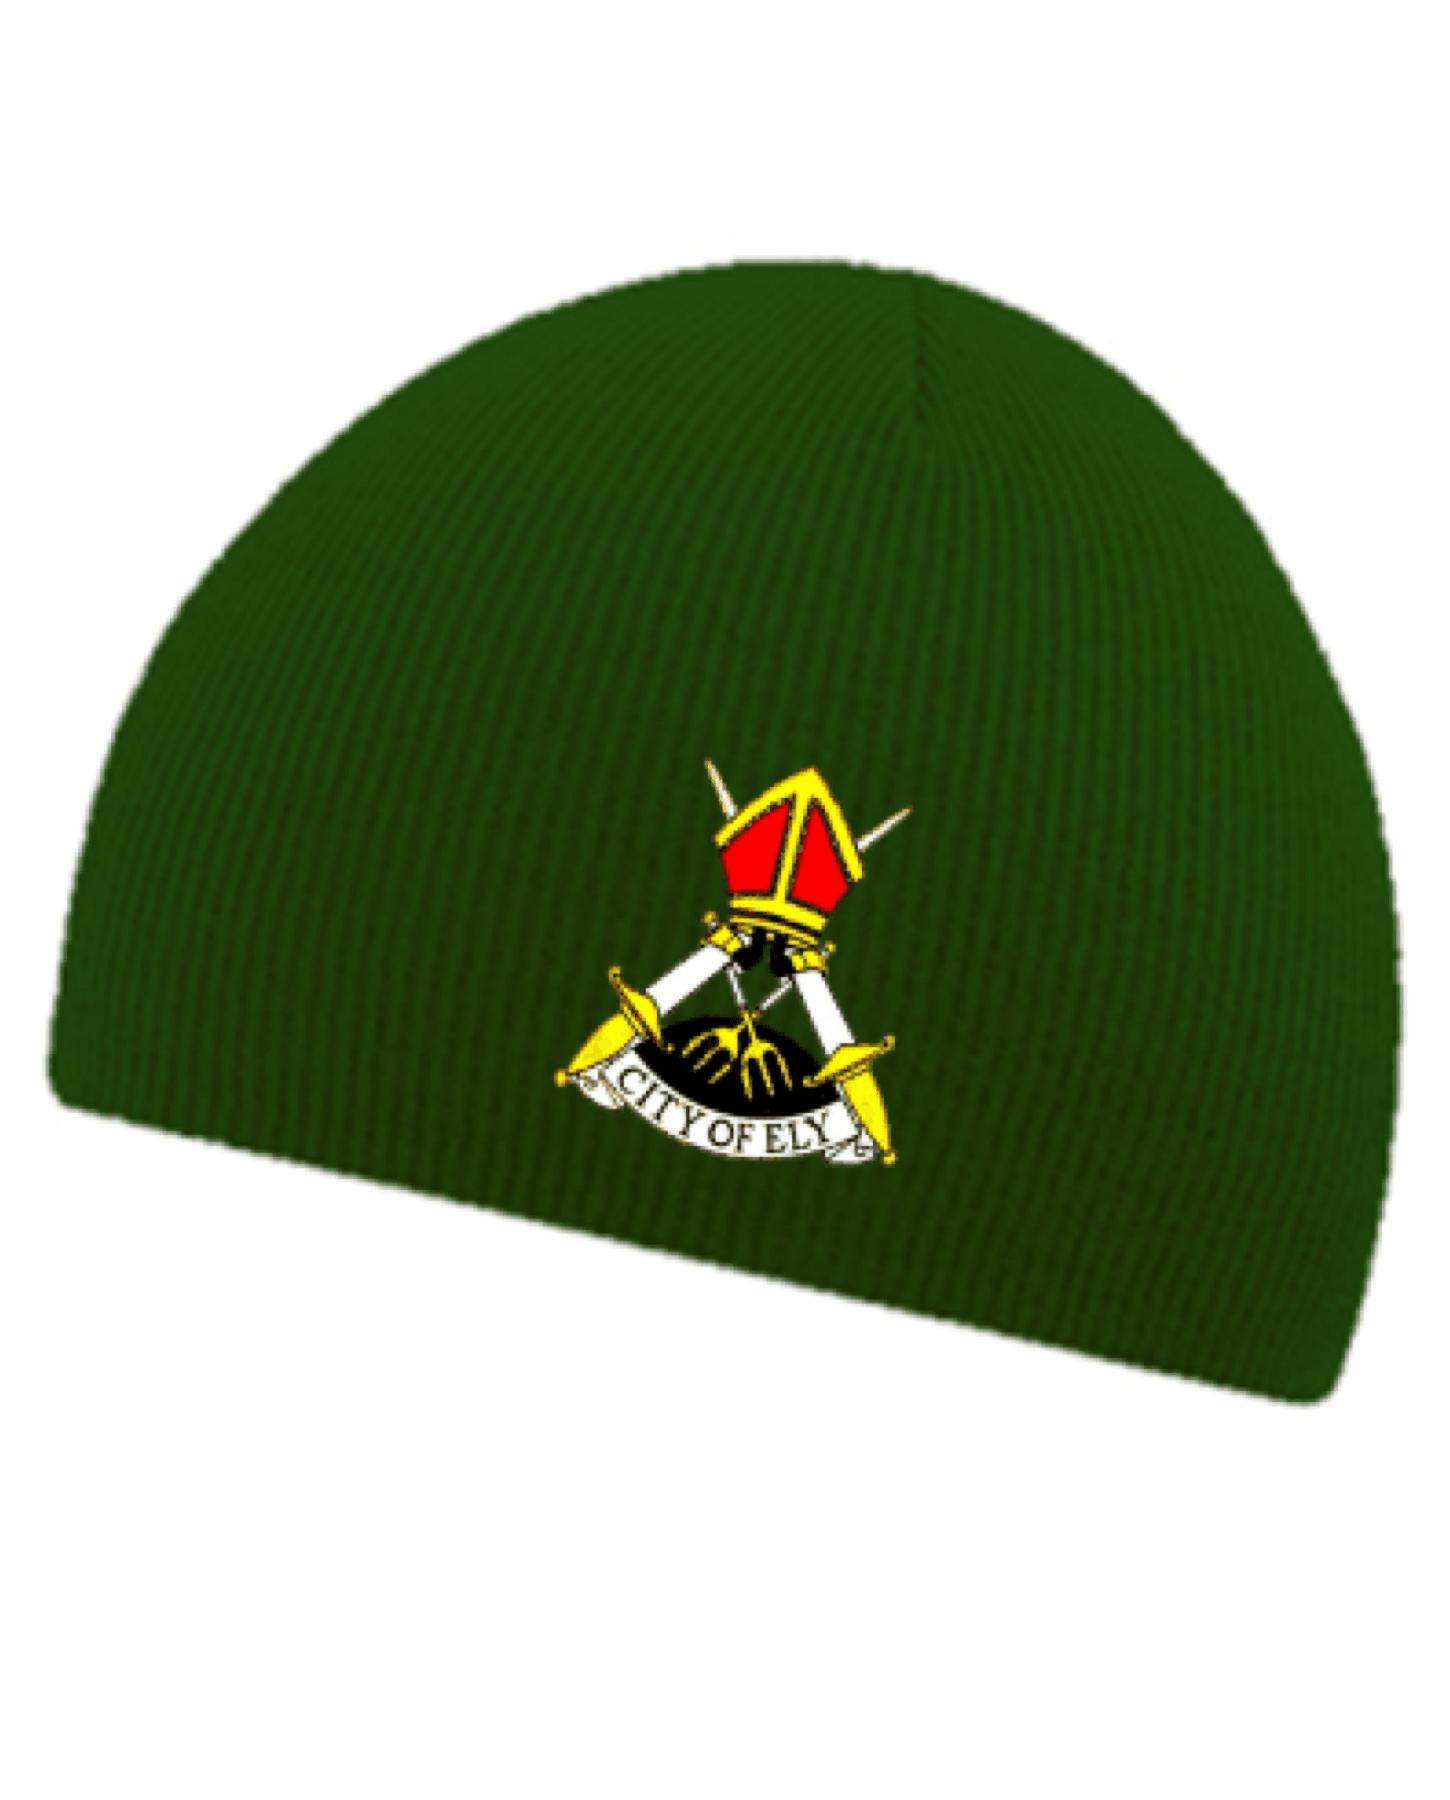 Ely City Hockey Club – Beanie